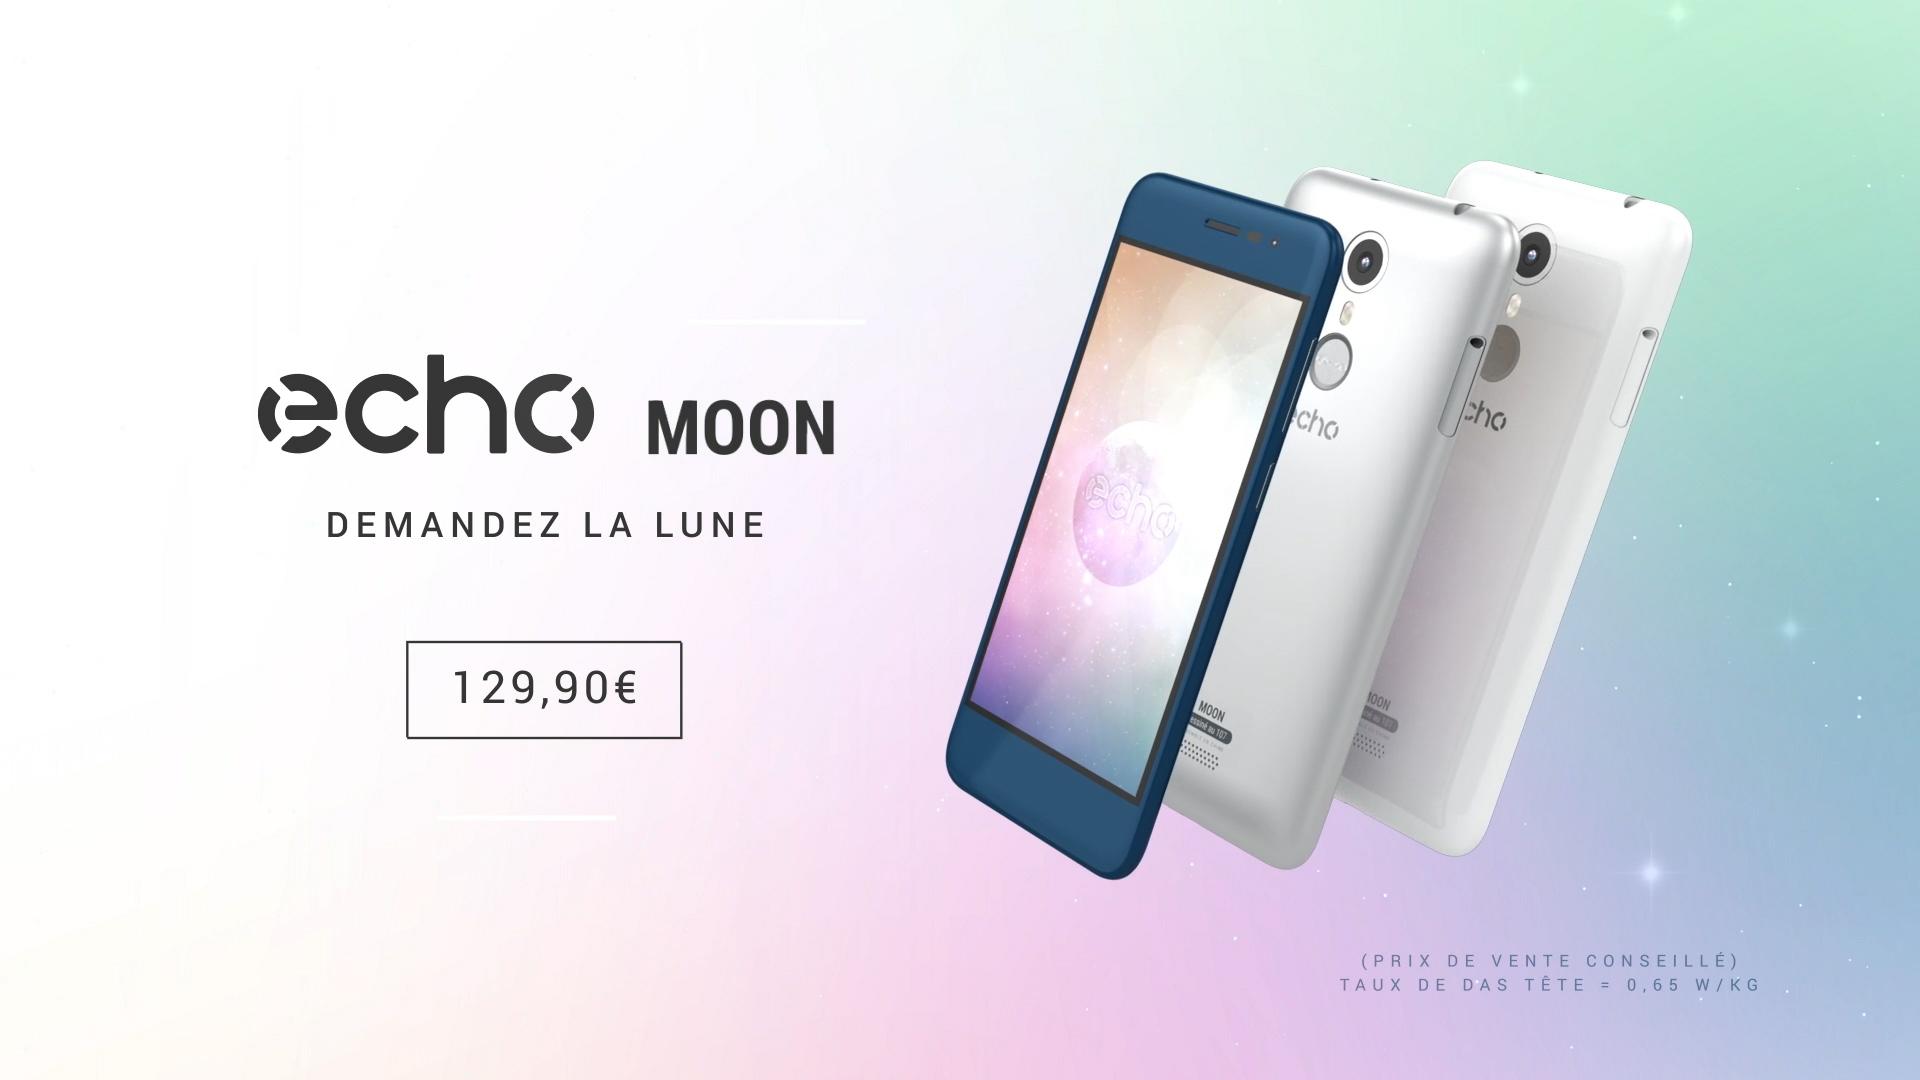 decouvrez-notre-smartphone-echo-moon (0-00-56-10).jpg